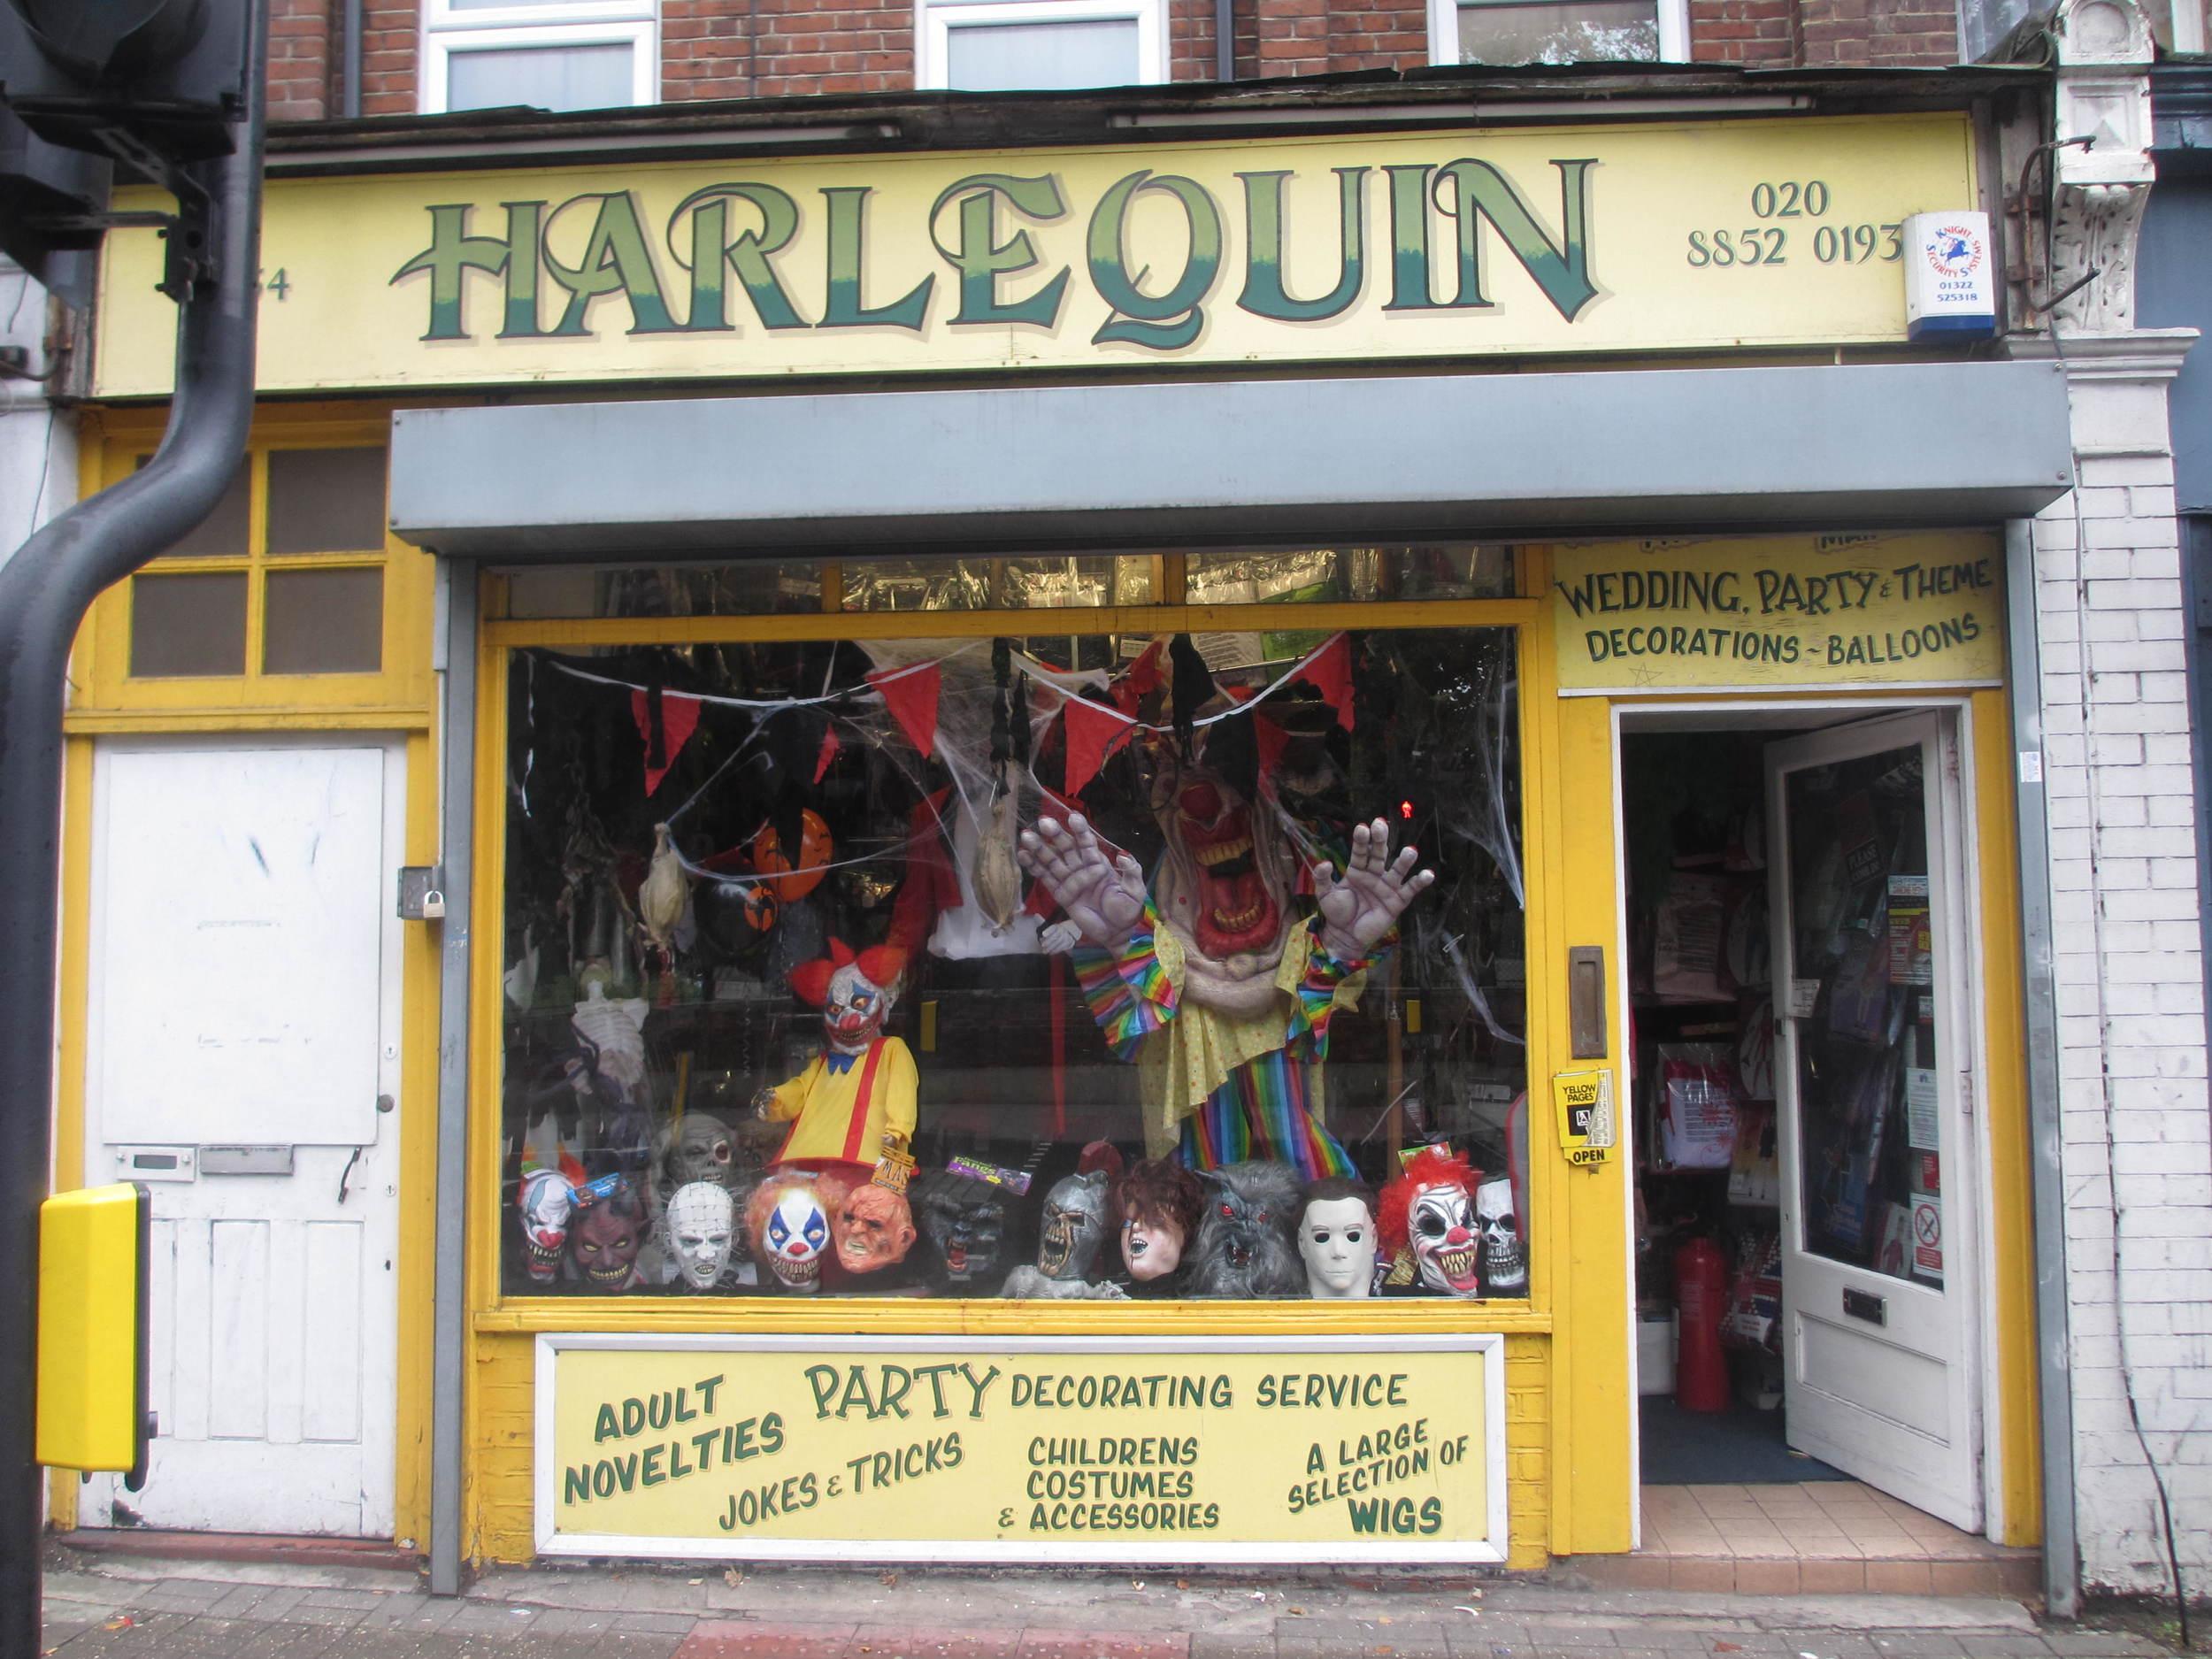 Harlequin Halloween Costume Shop in Lewisham